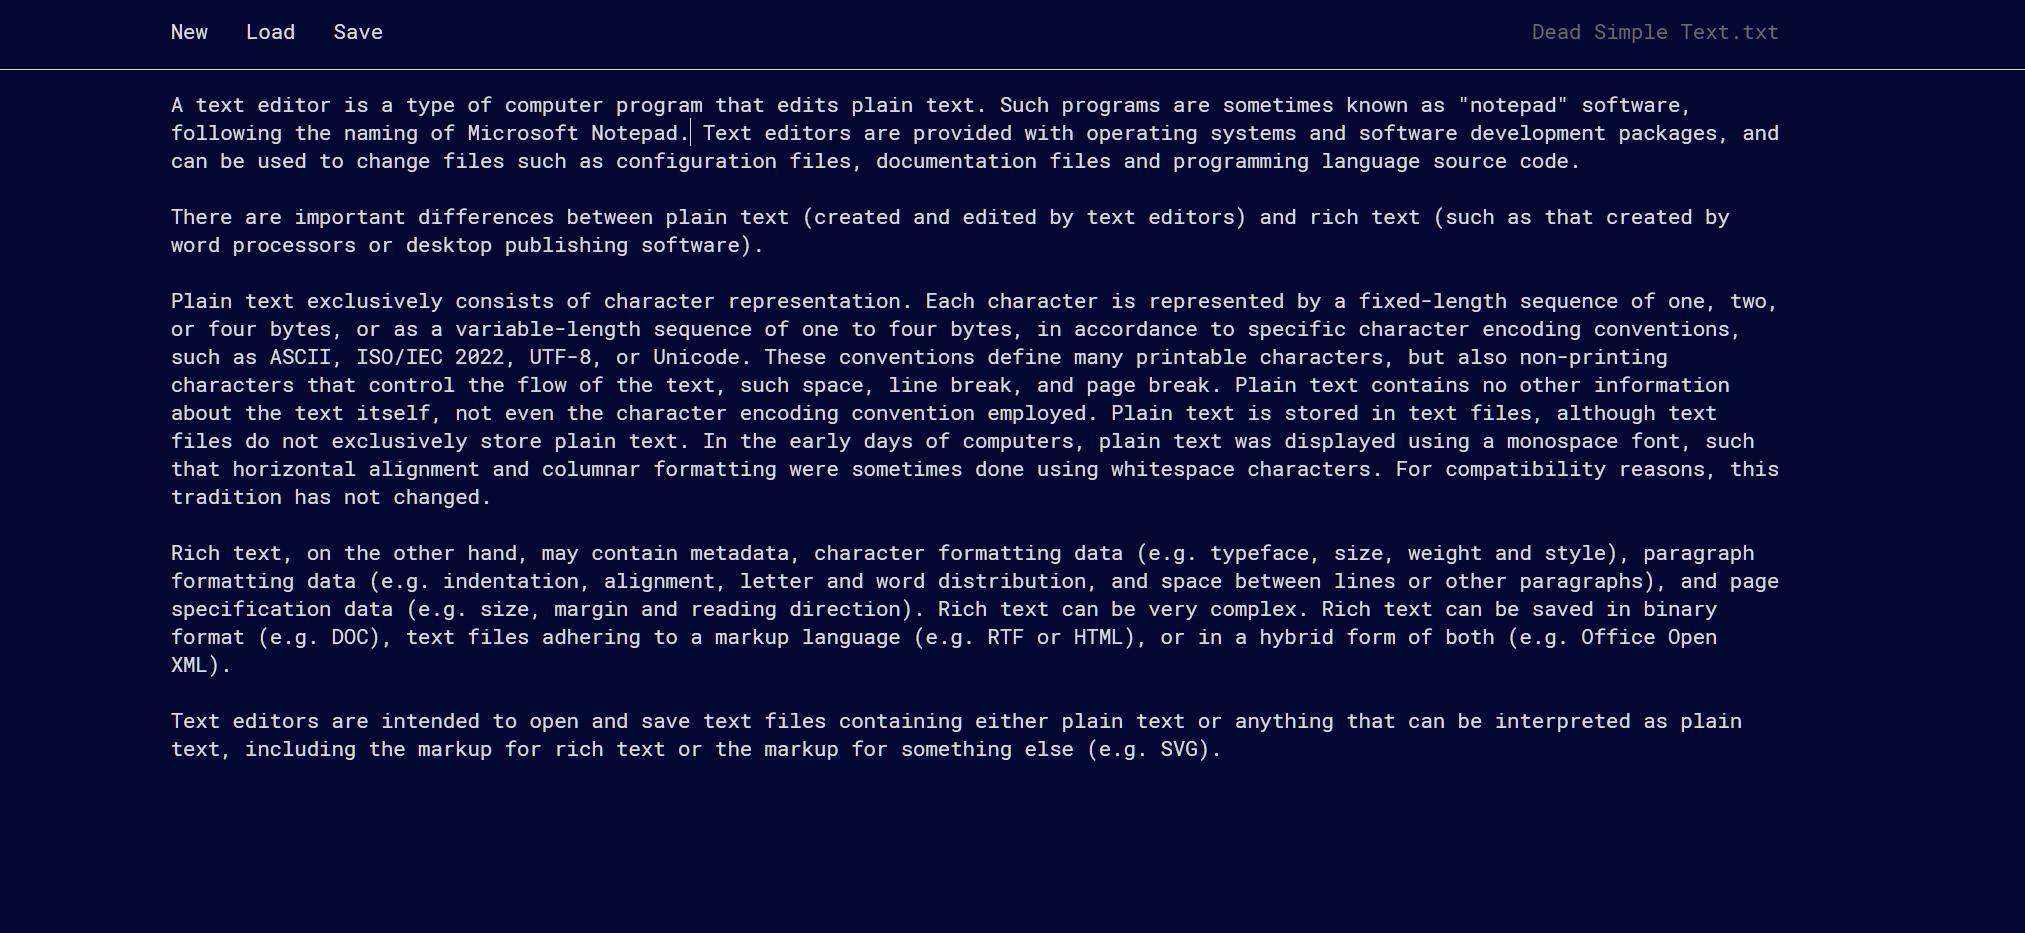 GitHub - jbreckmckye/dead-simple-text: Minimalist plain text editor